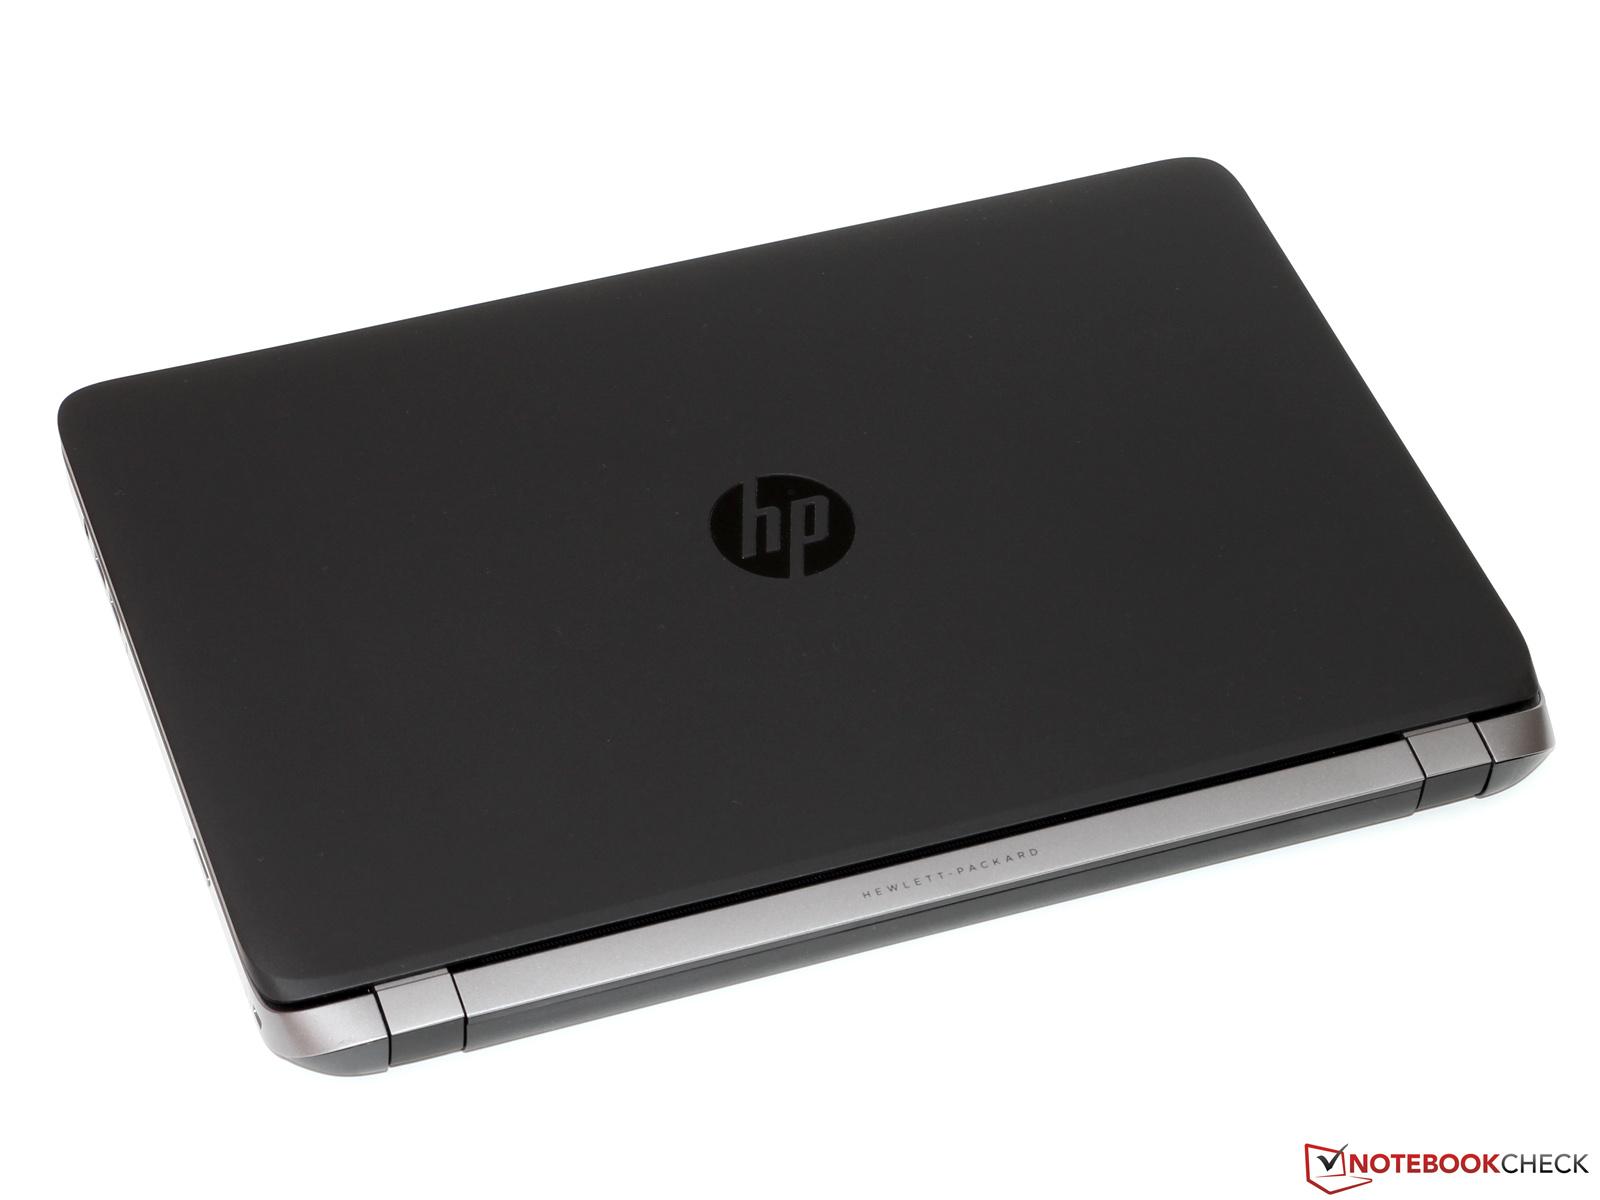 HP ProBook 445 G2 Realtek Card Reader Windows 8 Driver Download